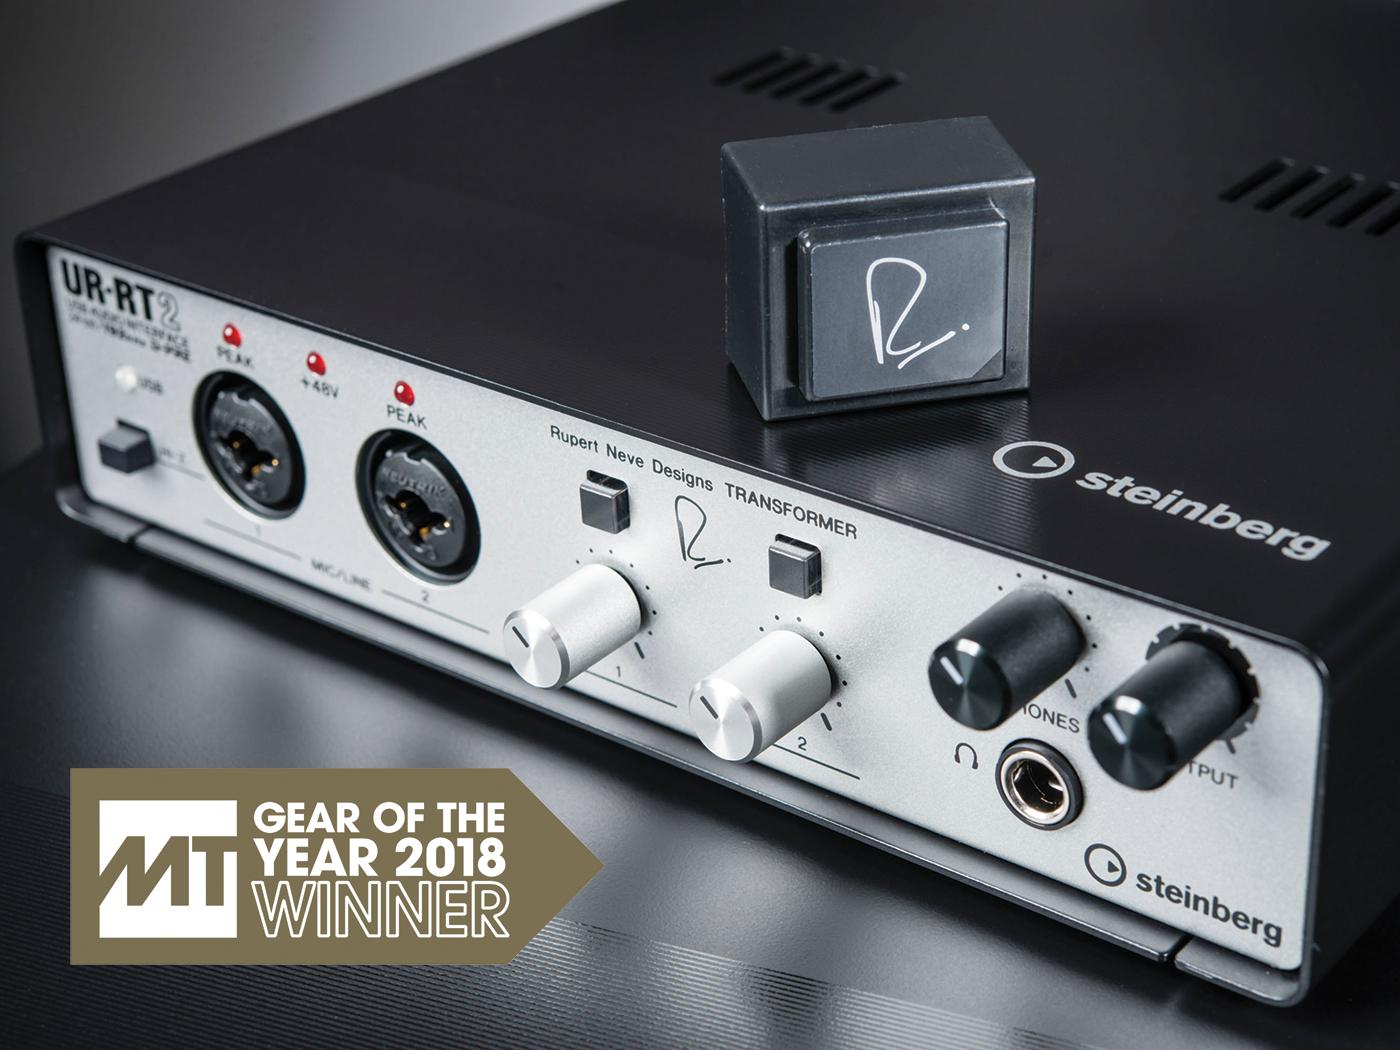 Gear of the Year 2018, Steinberg UR-RT range